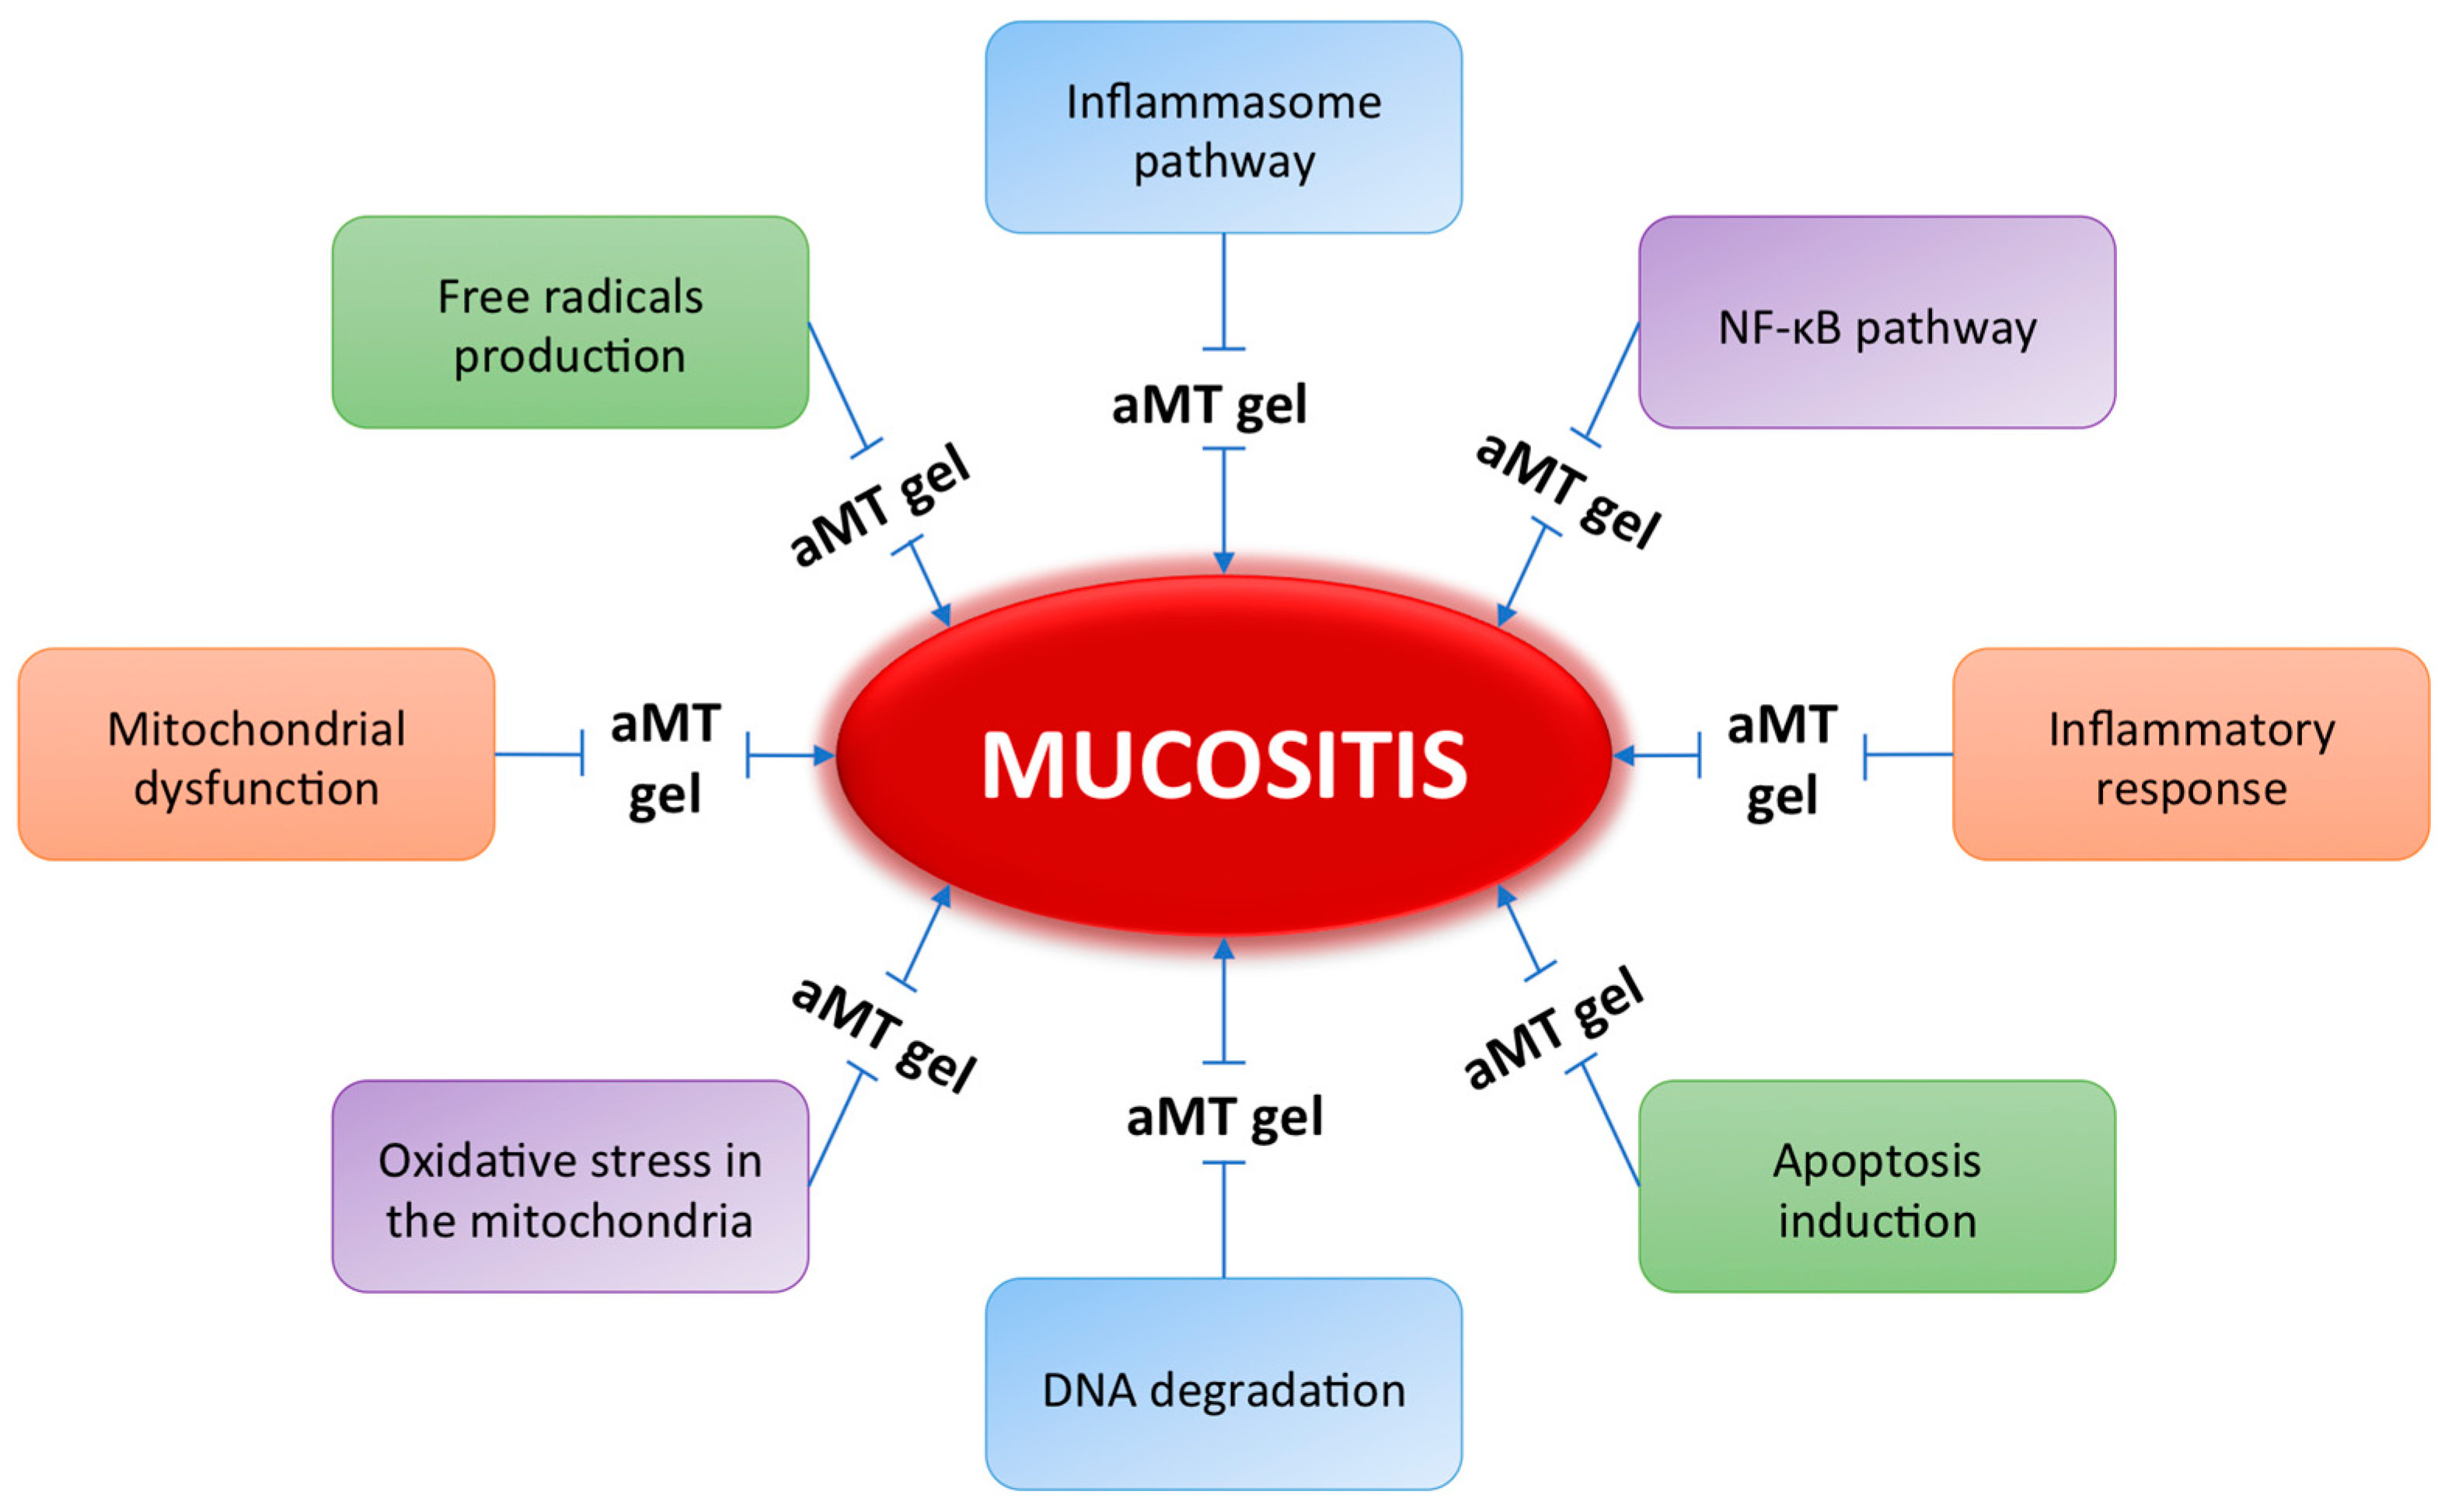 Stehle Flos ijms free text mucositis melatonin gel an effective